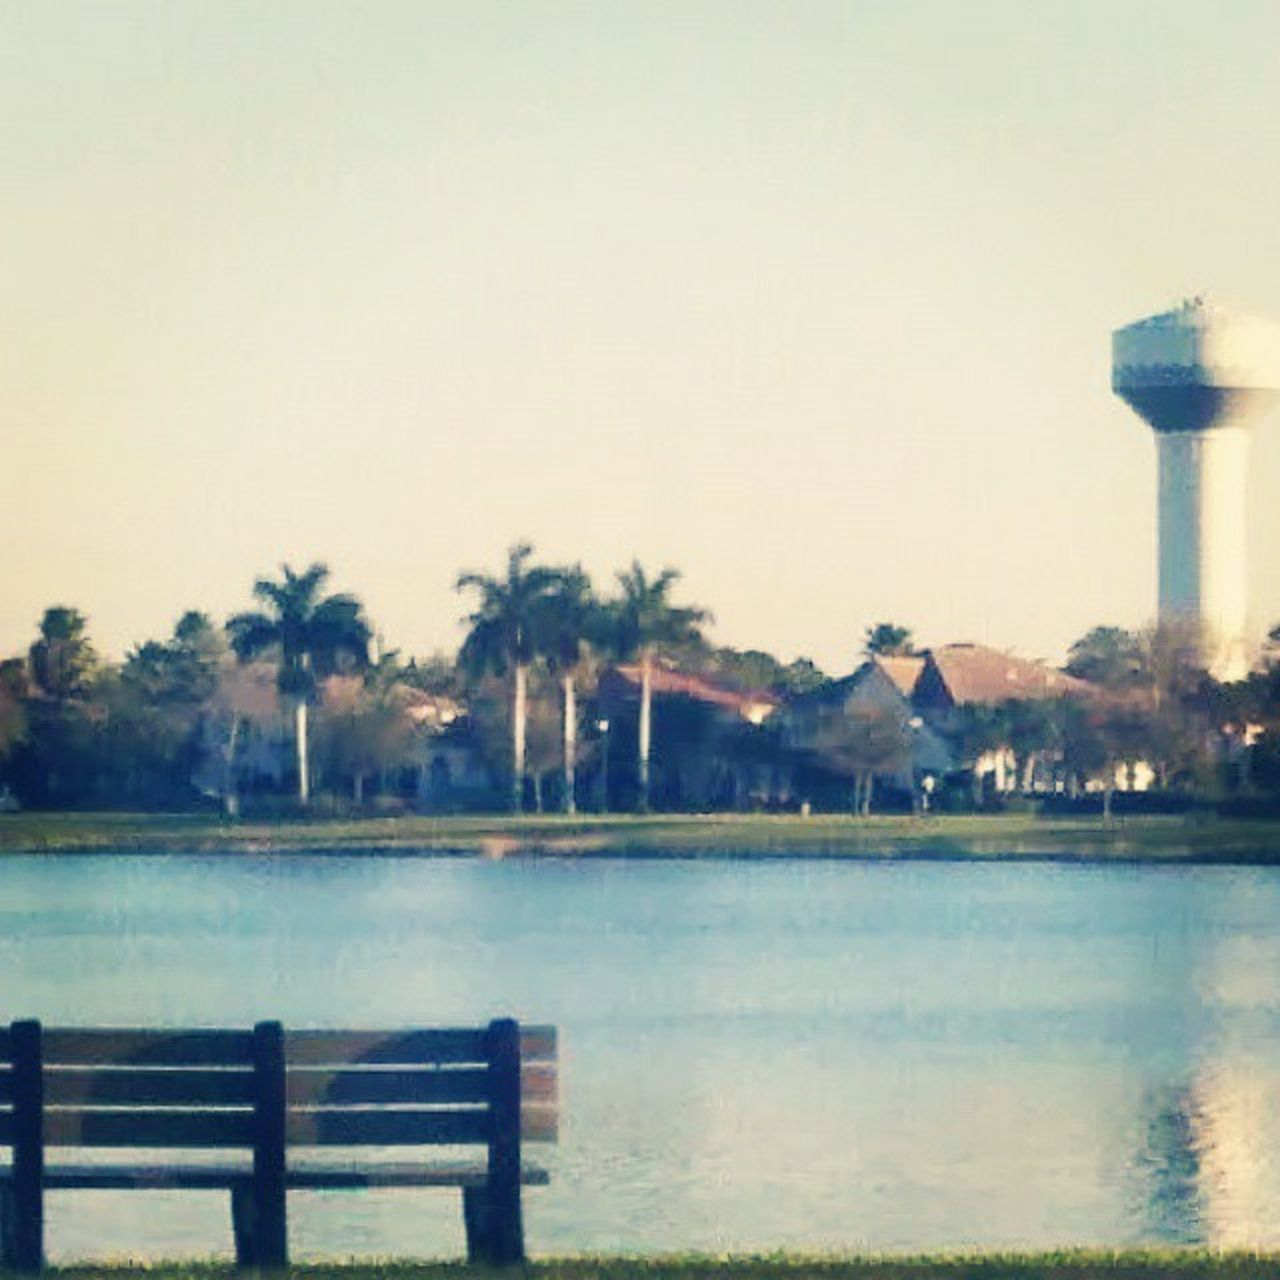 Lake Dorothy, Evergrene. Palm Beach Gardens, FL. Retro vibes. Jj_forum_1259 Rsa_water_calm Rsa_water Jj_forum_1291 jj_forum_1313 jj_forum_1328 gramoftheday gotd_939 gotd_940 gotd_943 gotd_959